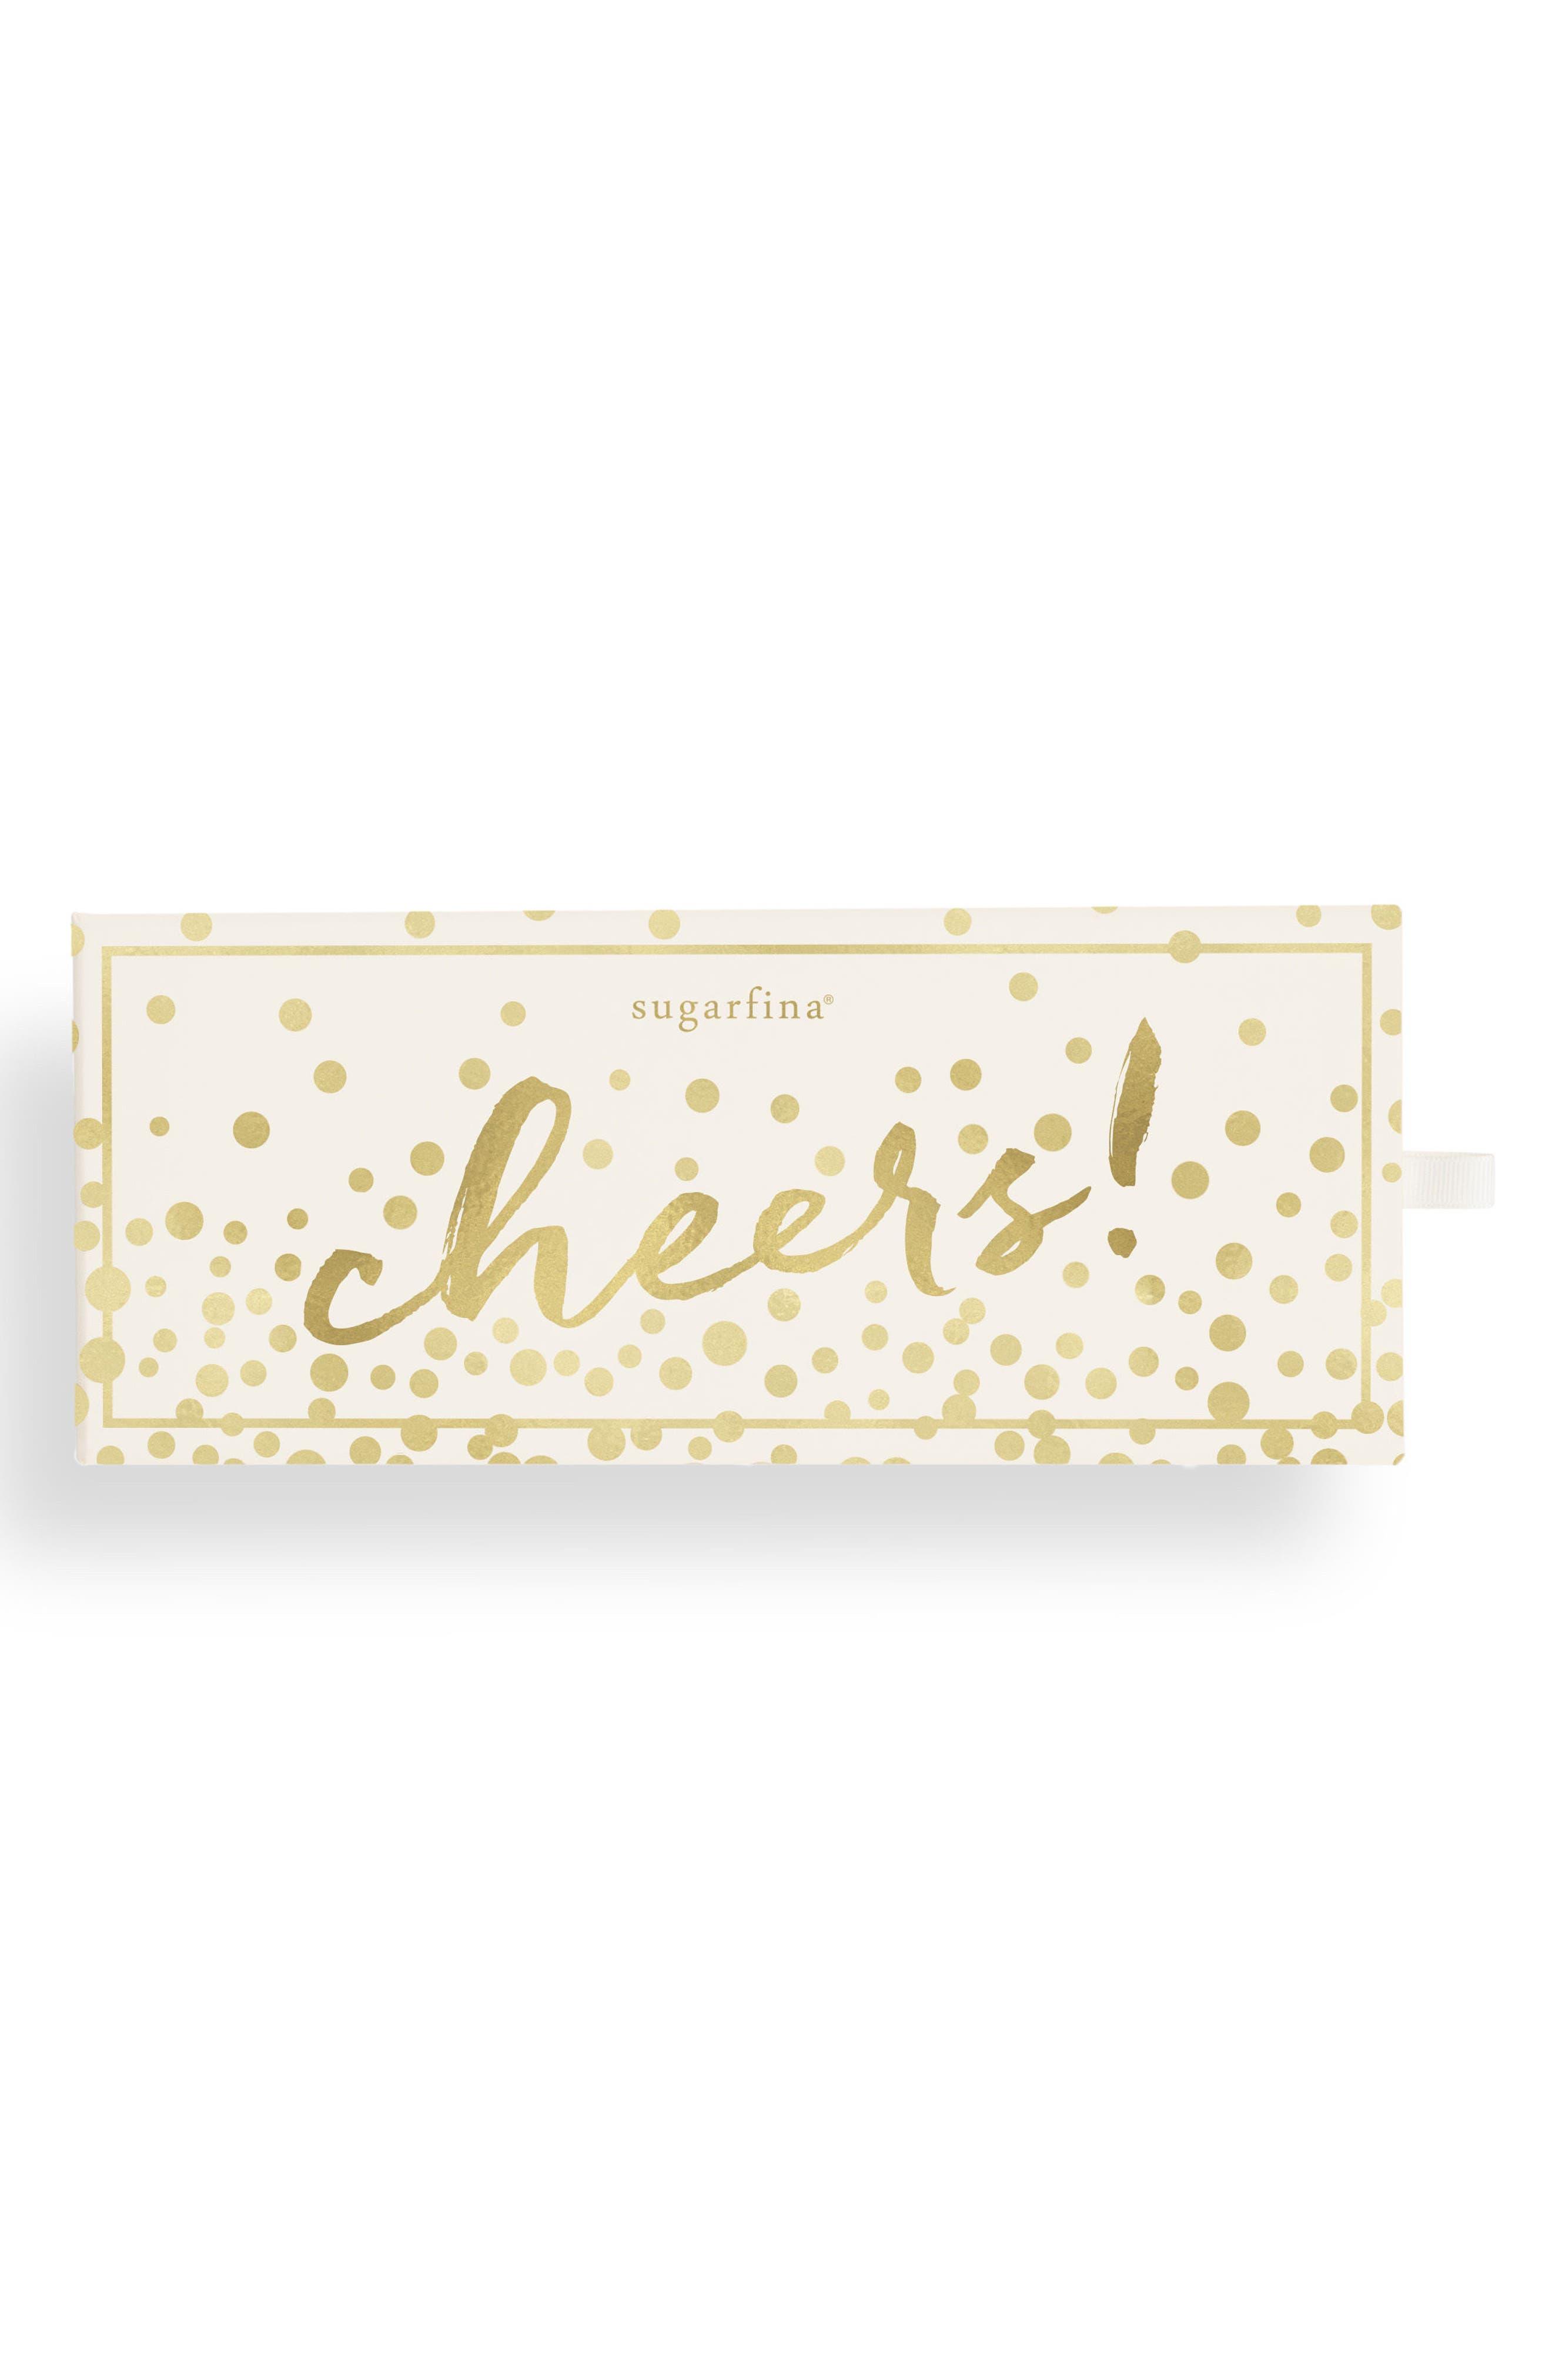 Cheers 3-Piece Candy Bento Box,                             Main thumbnail 1, color,                             100